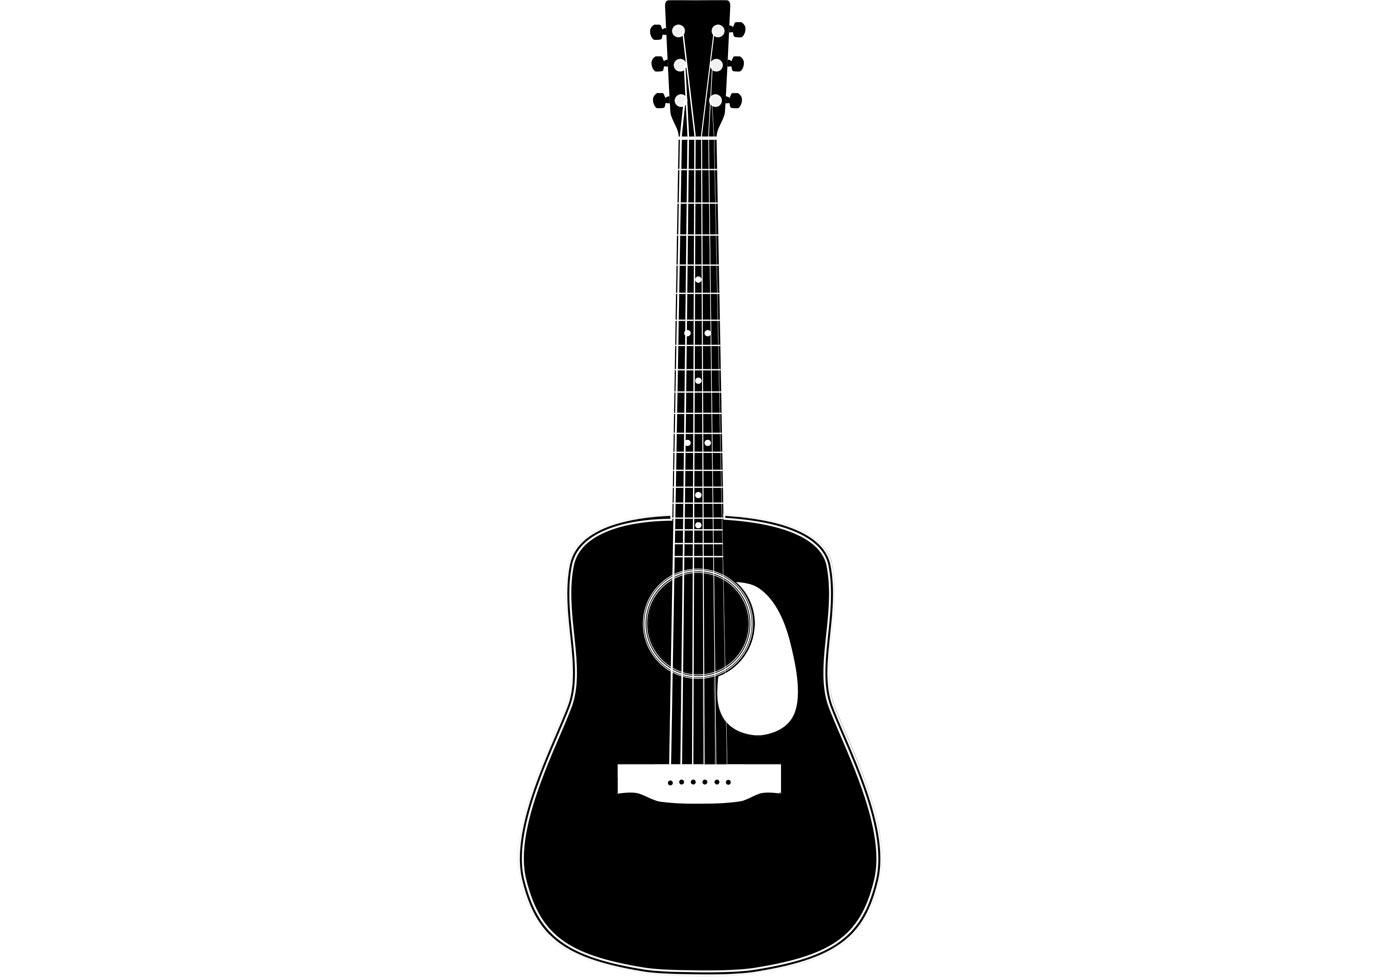 vector-guitar.jpg